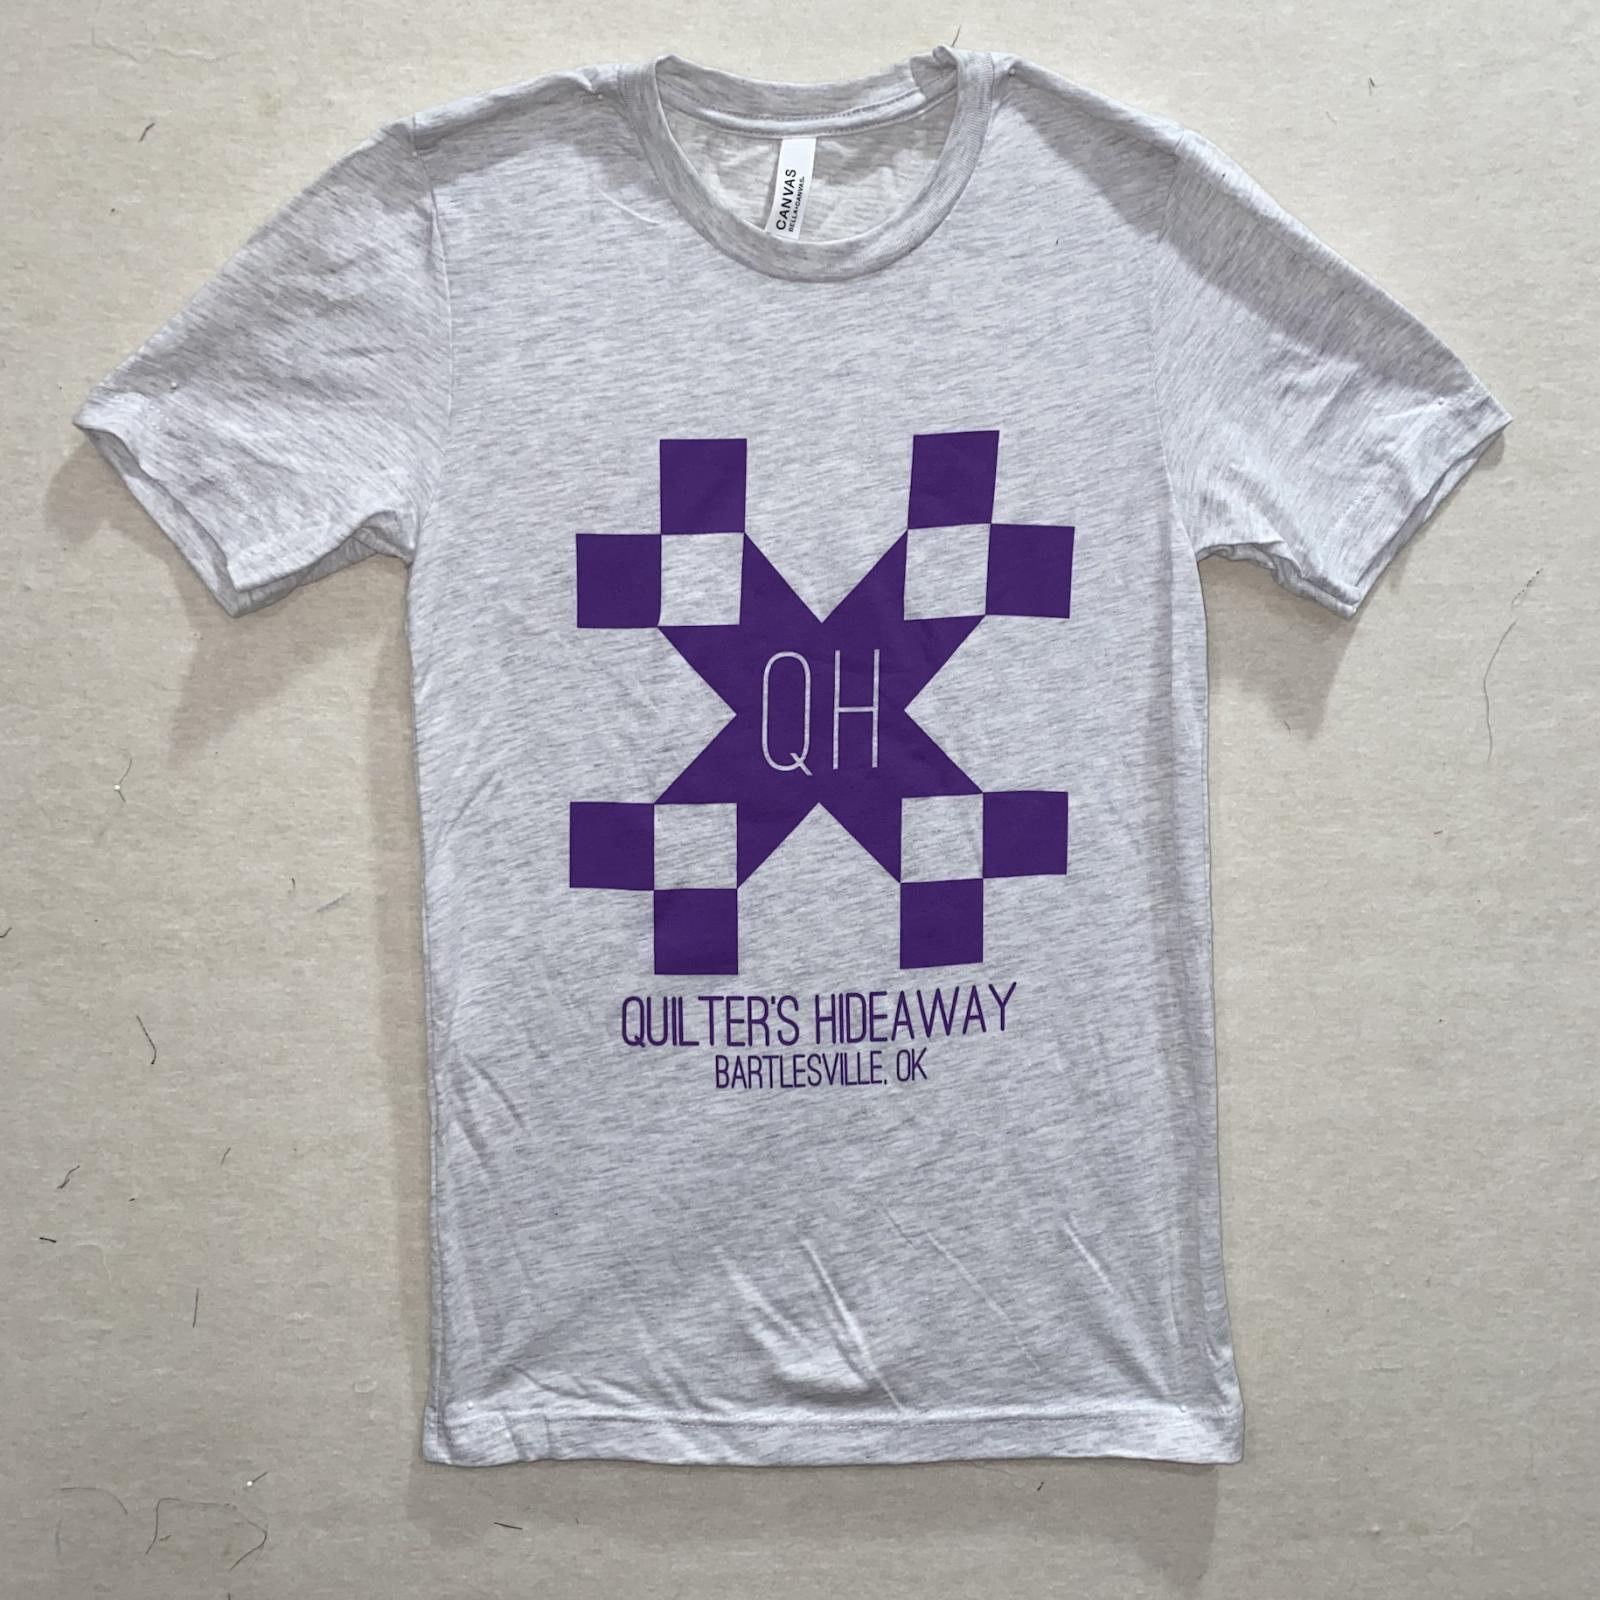 QH Ash Short Sleeve Shirt - Extra Large